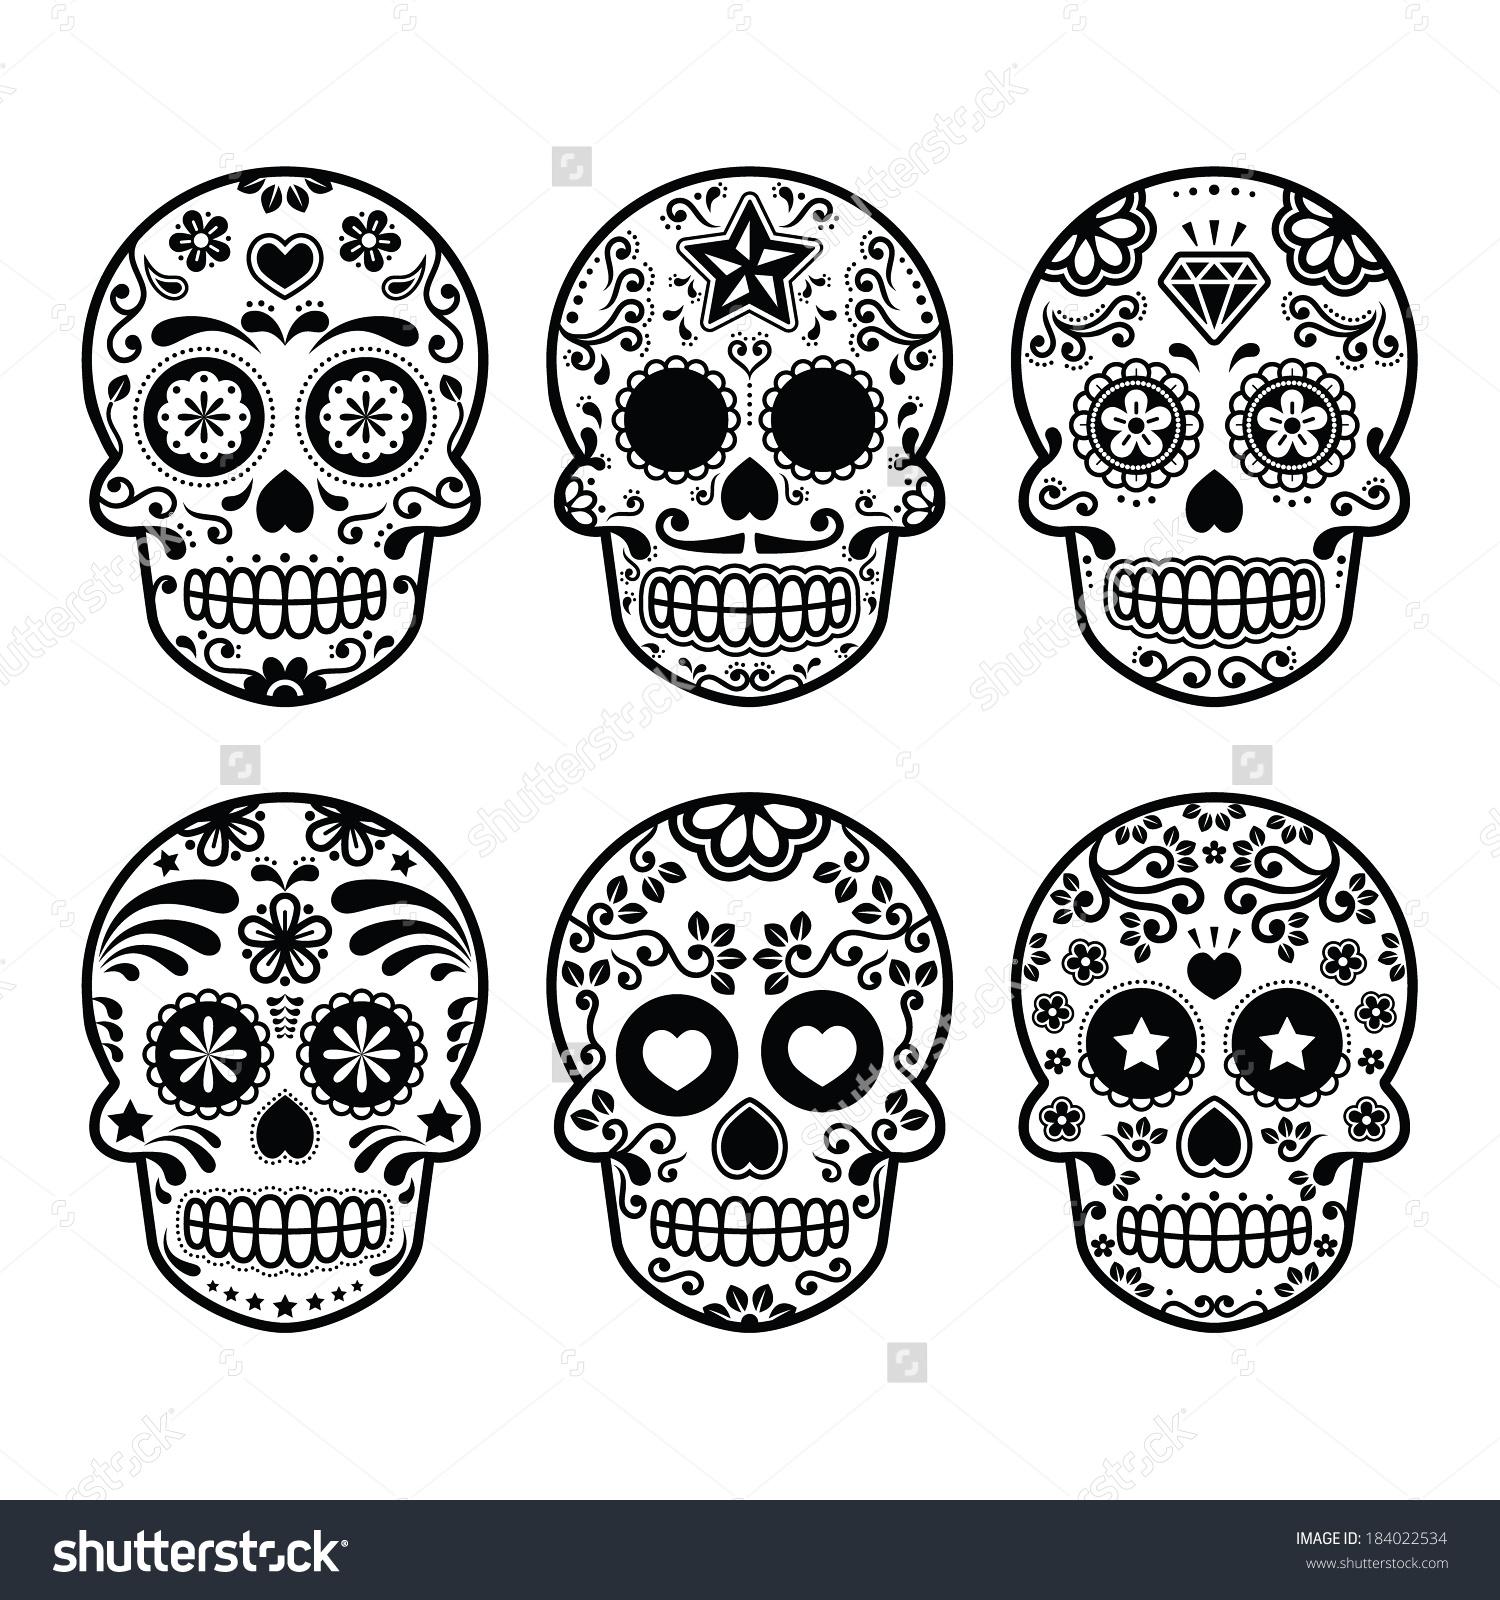 Images of Sugar Skull | 1500x1600